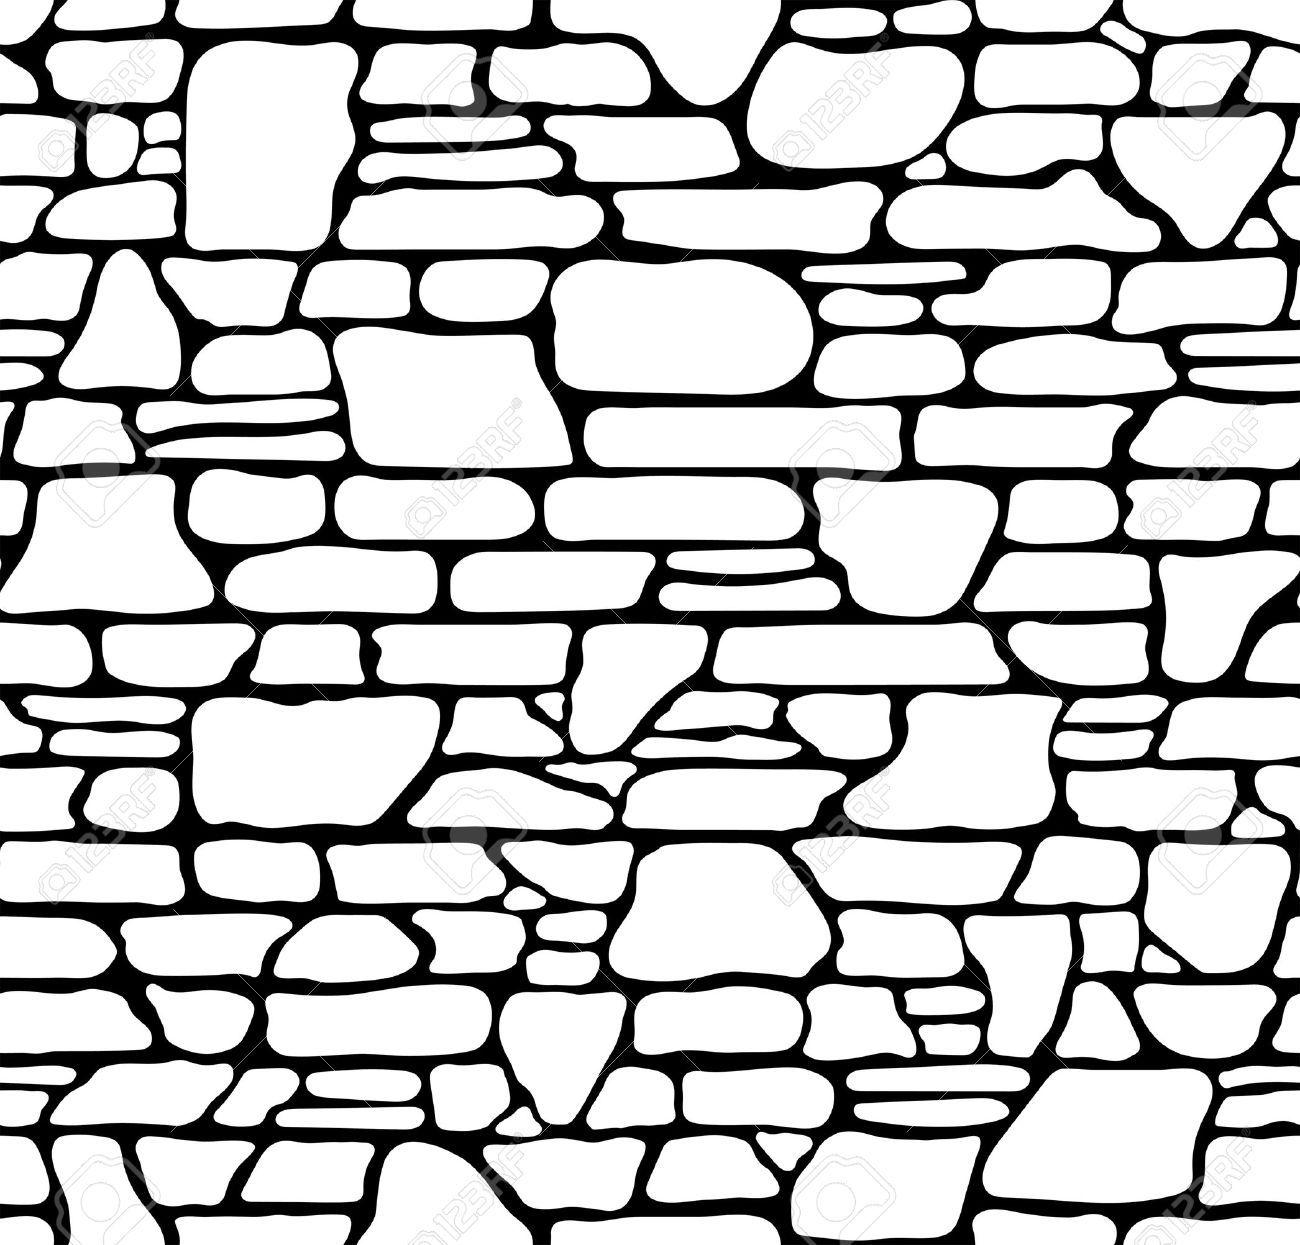 Free clipart ton of bricks jpg transparent download Stock Vector   素材 in 2019   Brick texture, Textured walls, Wall ... jpg transparent download